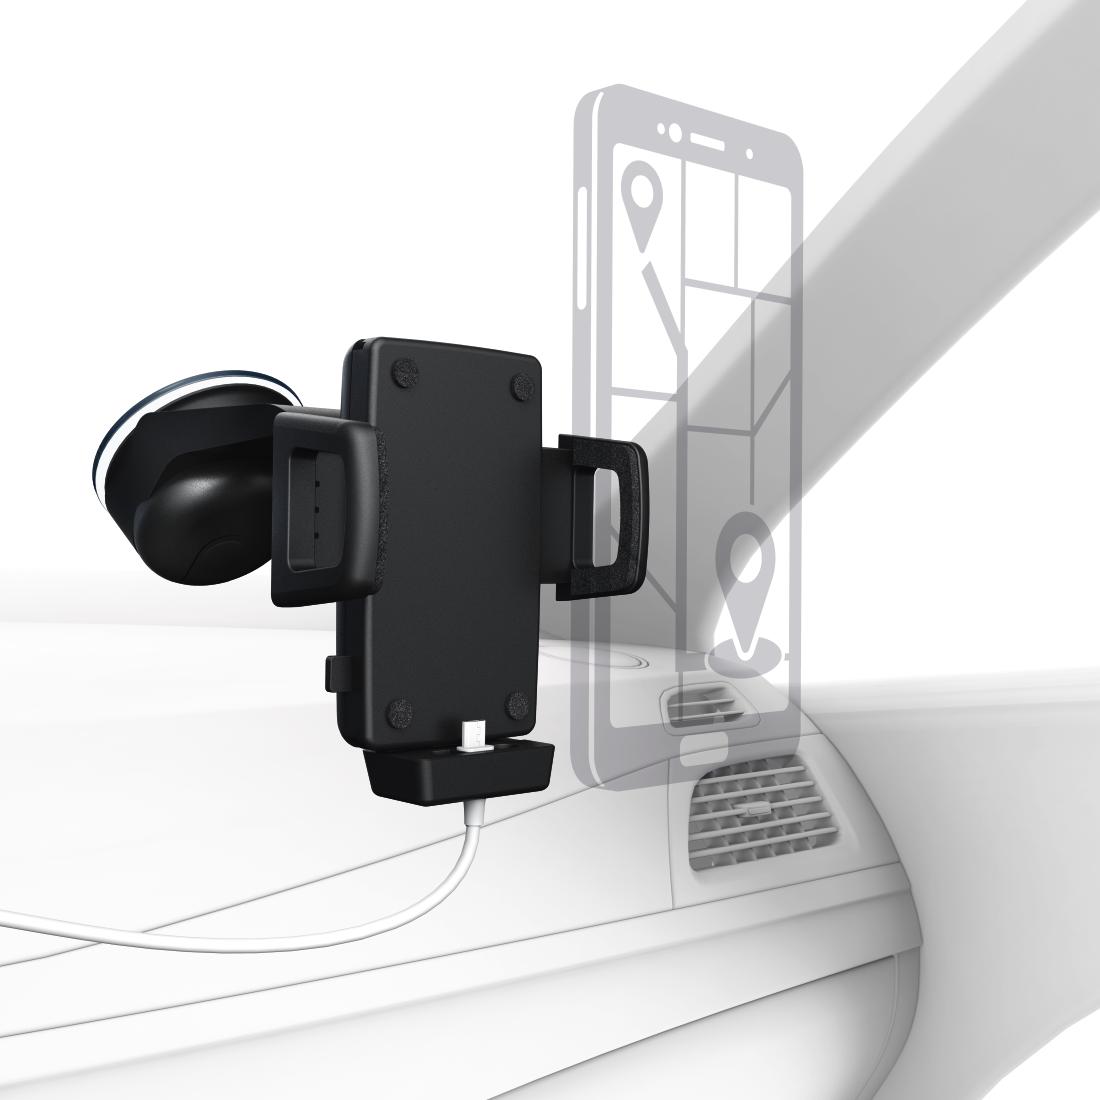 00178221 hama uni smartphone halter mit ladefunktion f r ger te mit breite 5 5 8 cm hama de. Black Bedroom Furniture Sets. Home Design Ideas